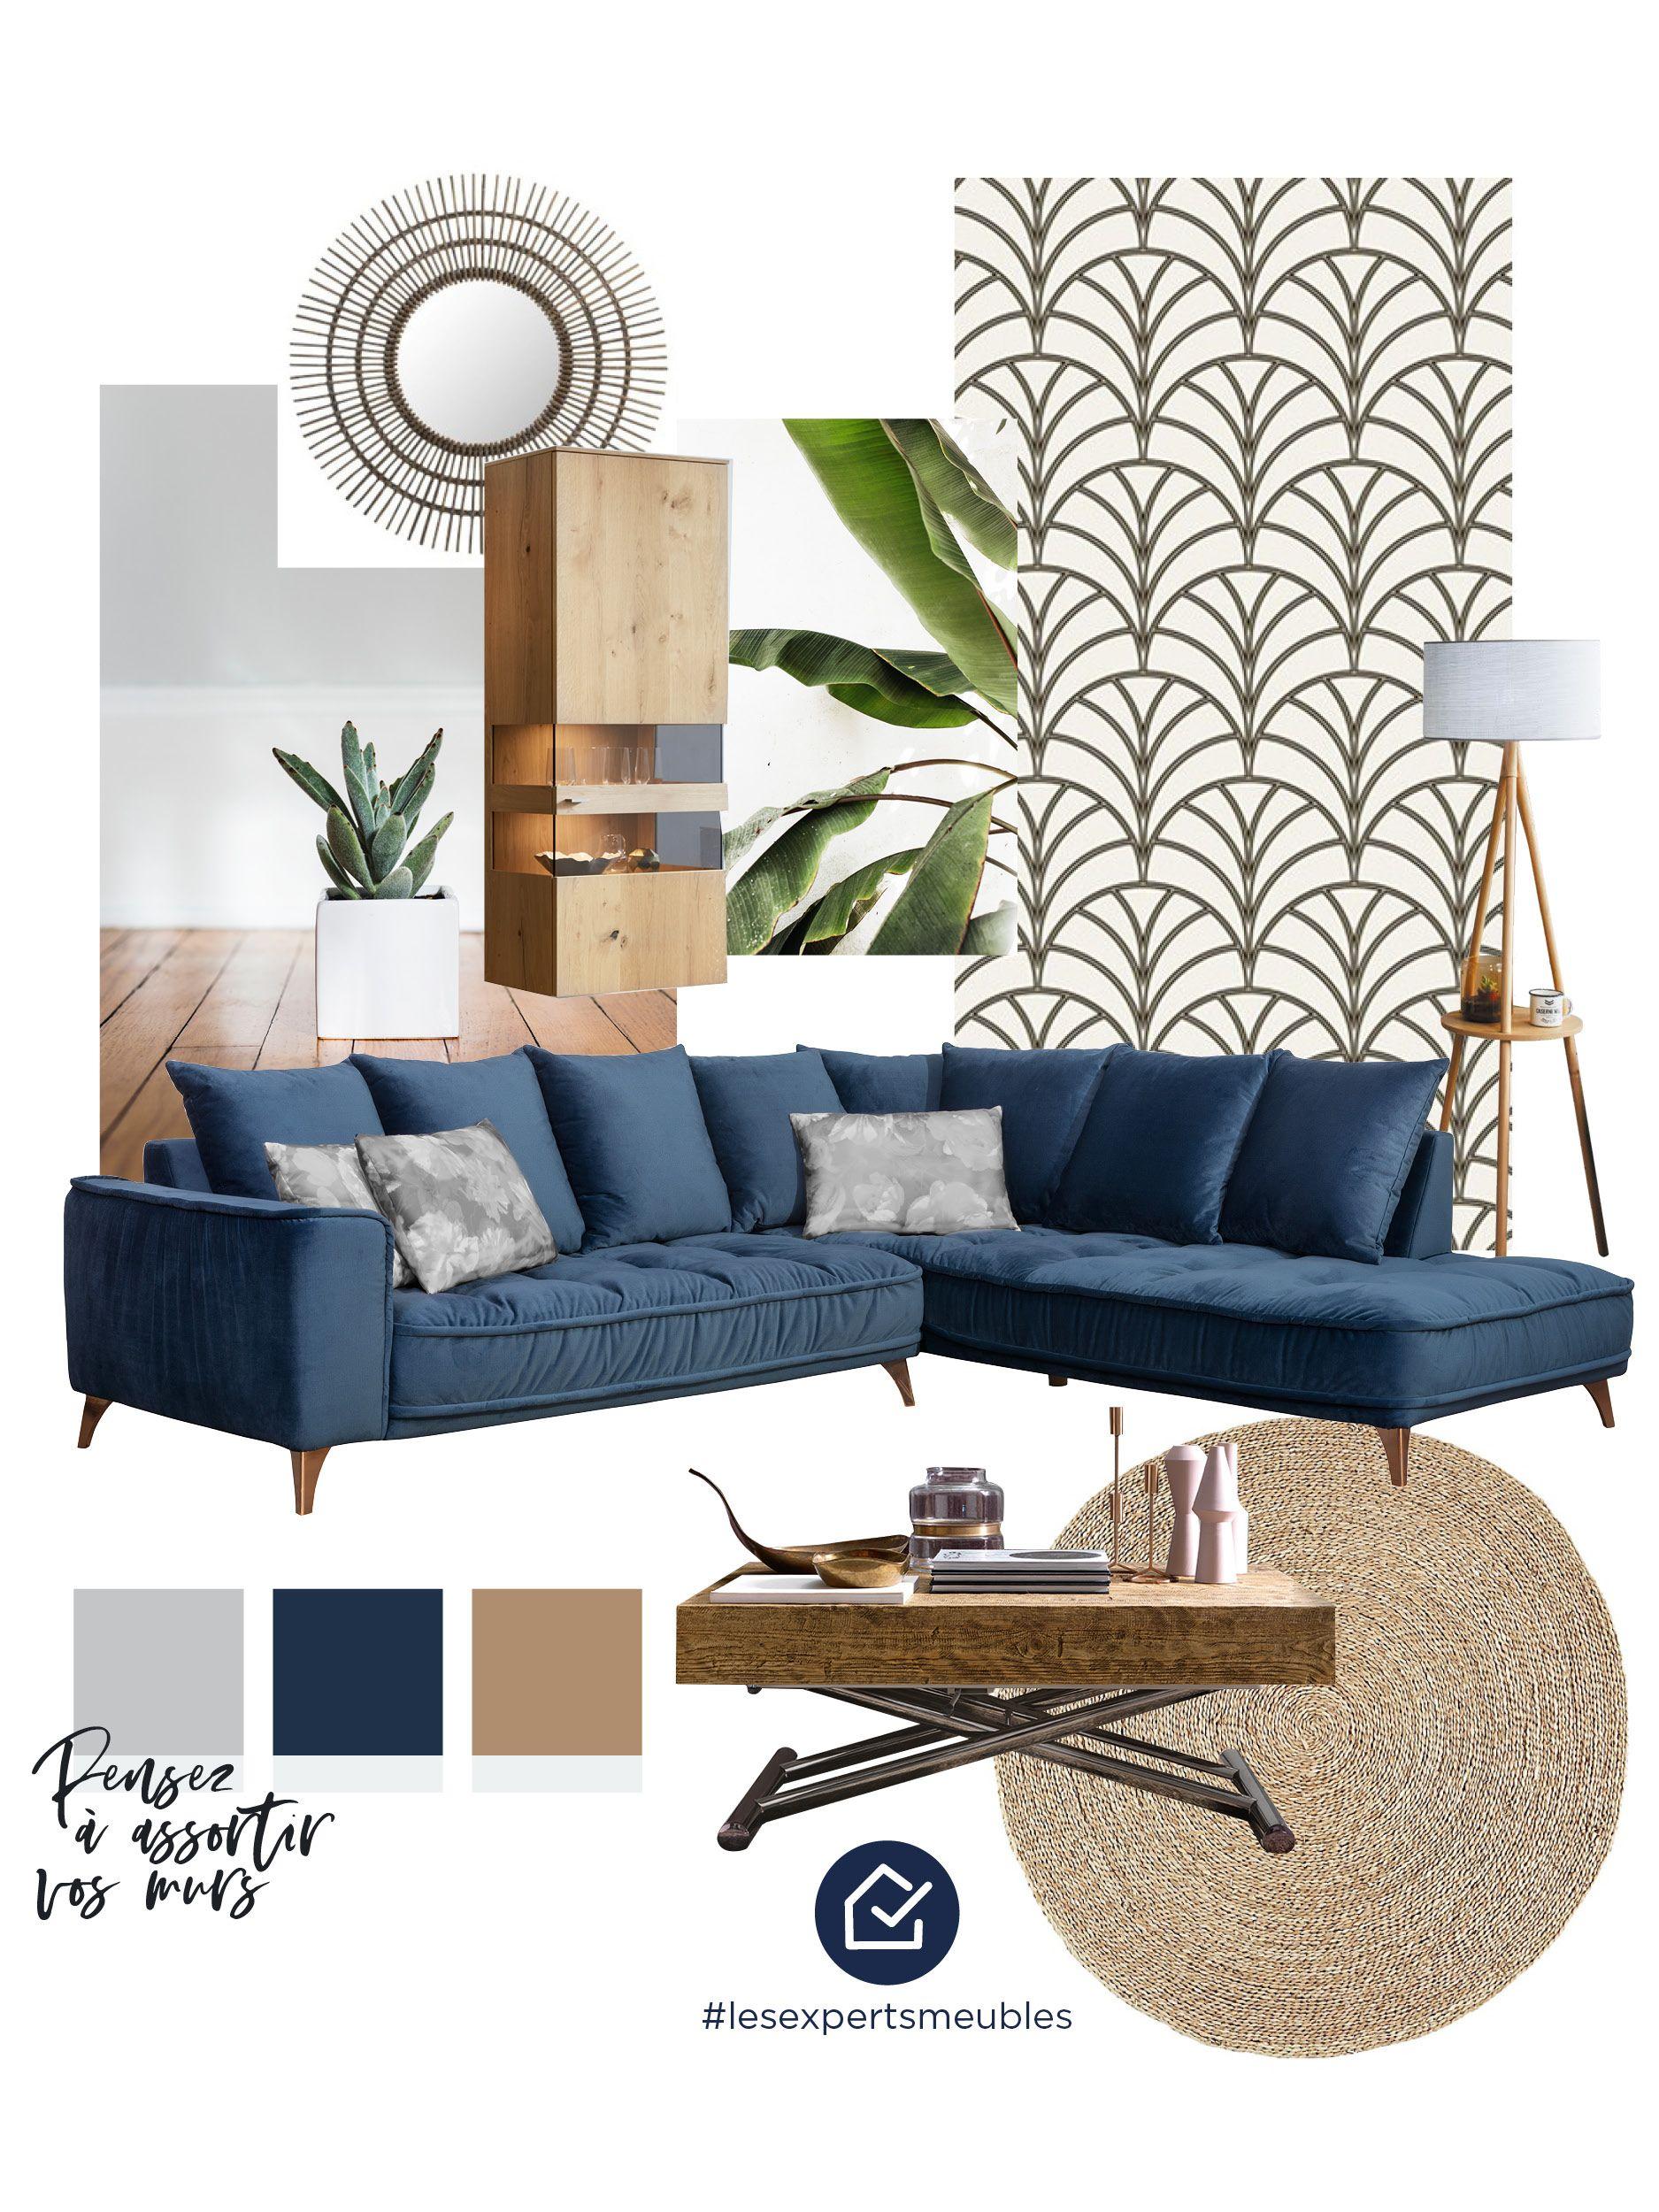 Best Of Interior Design And Architecture Ideas House Interior Design Styles Home Interior Design House Interior